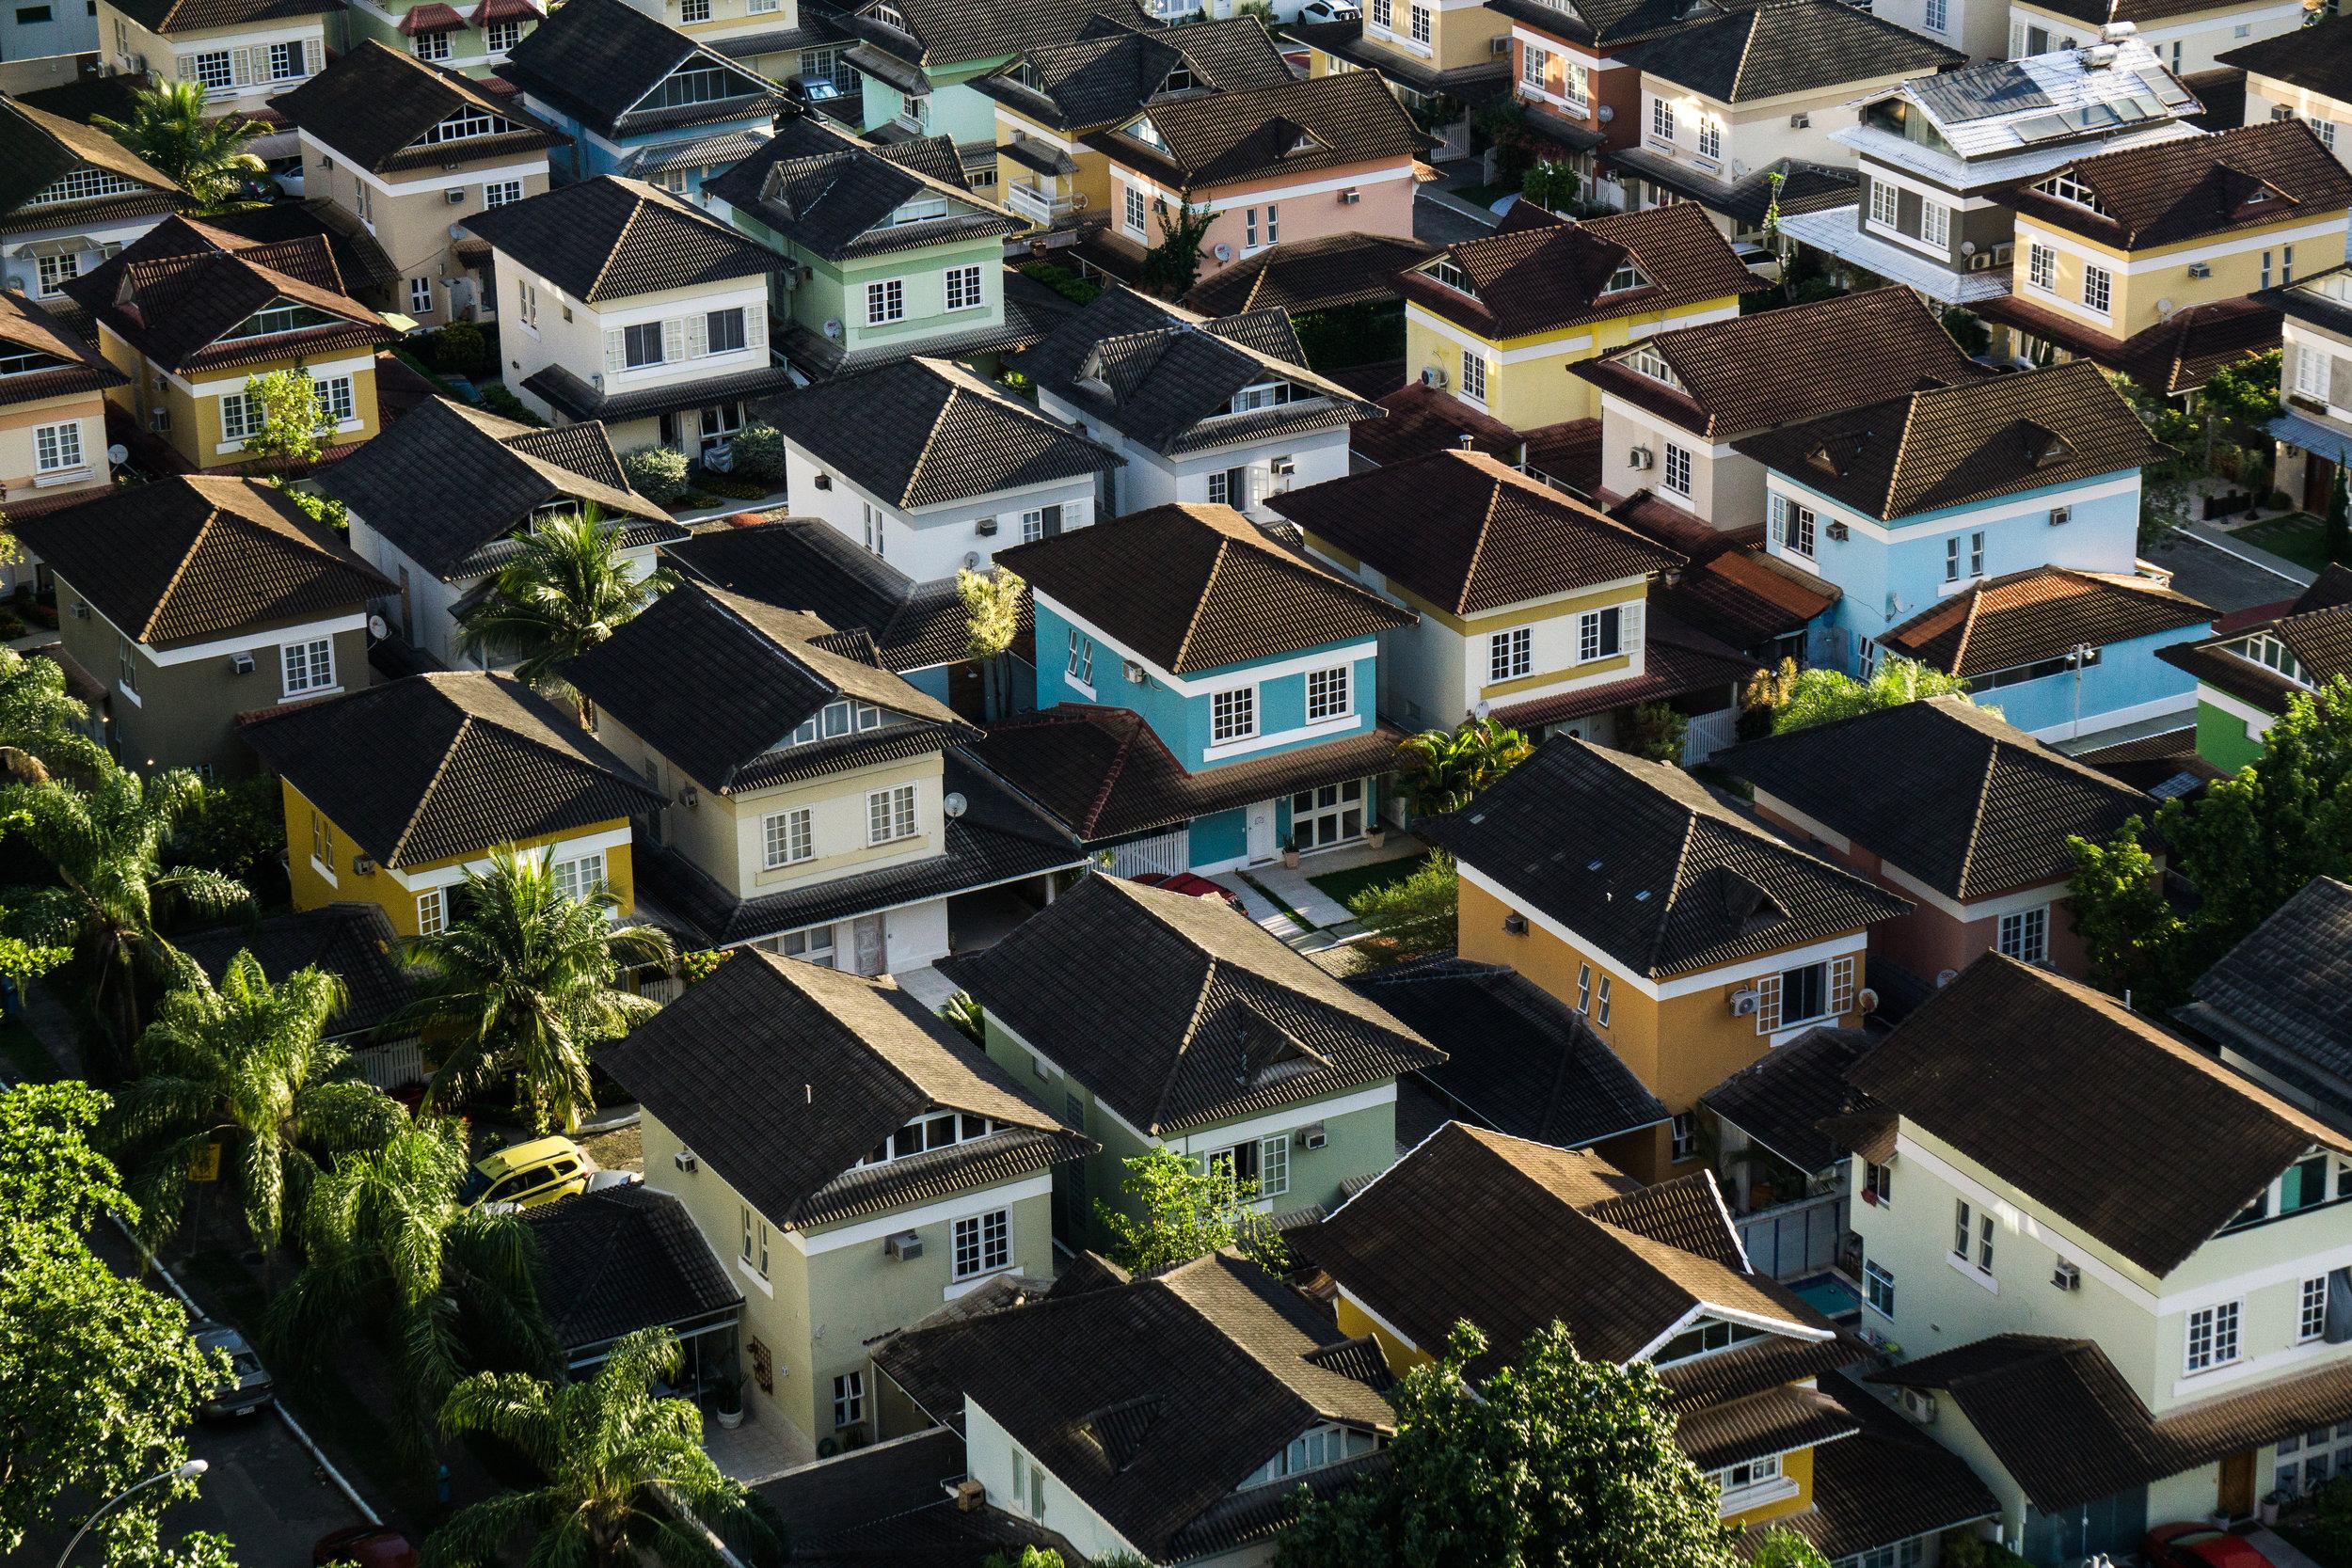 southeastern-premier-roofing-358667-unsplash.jpg